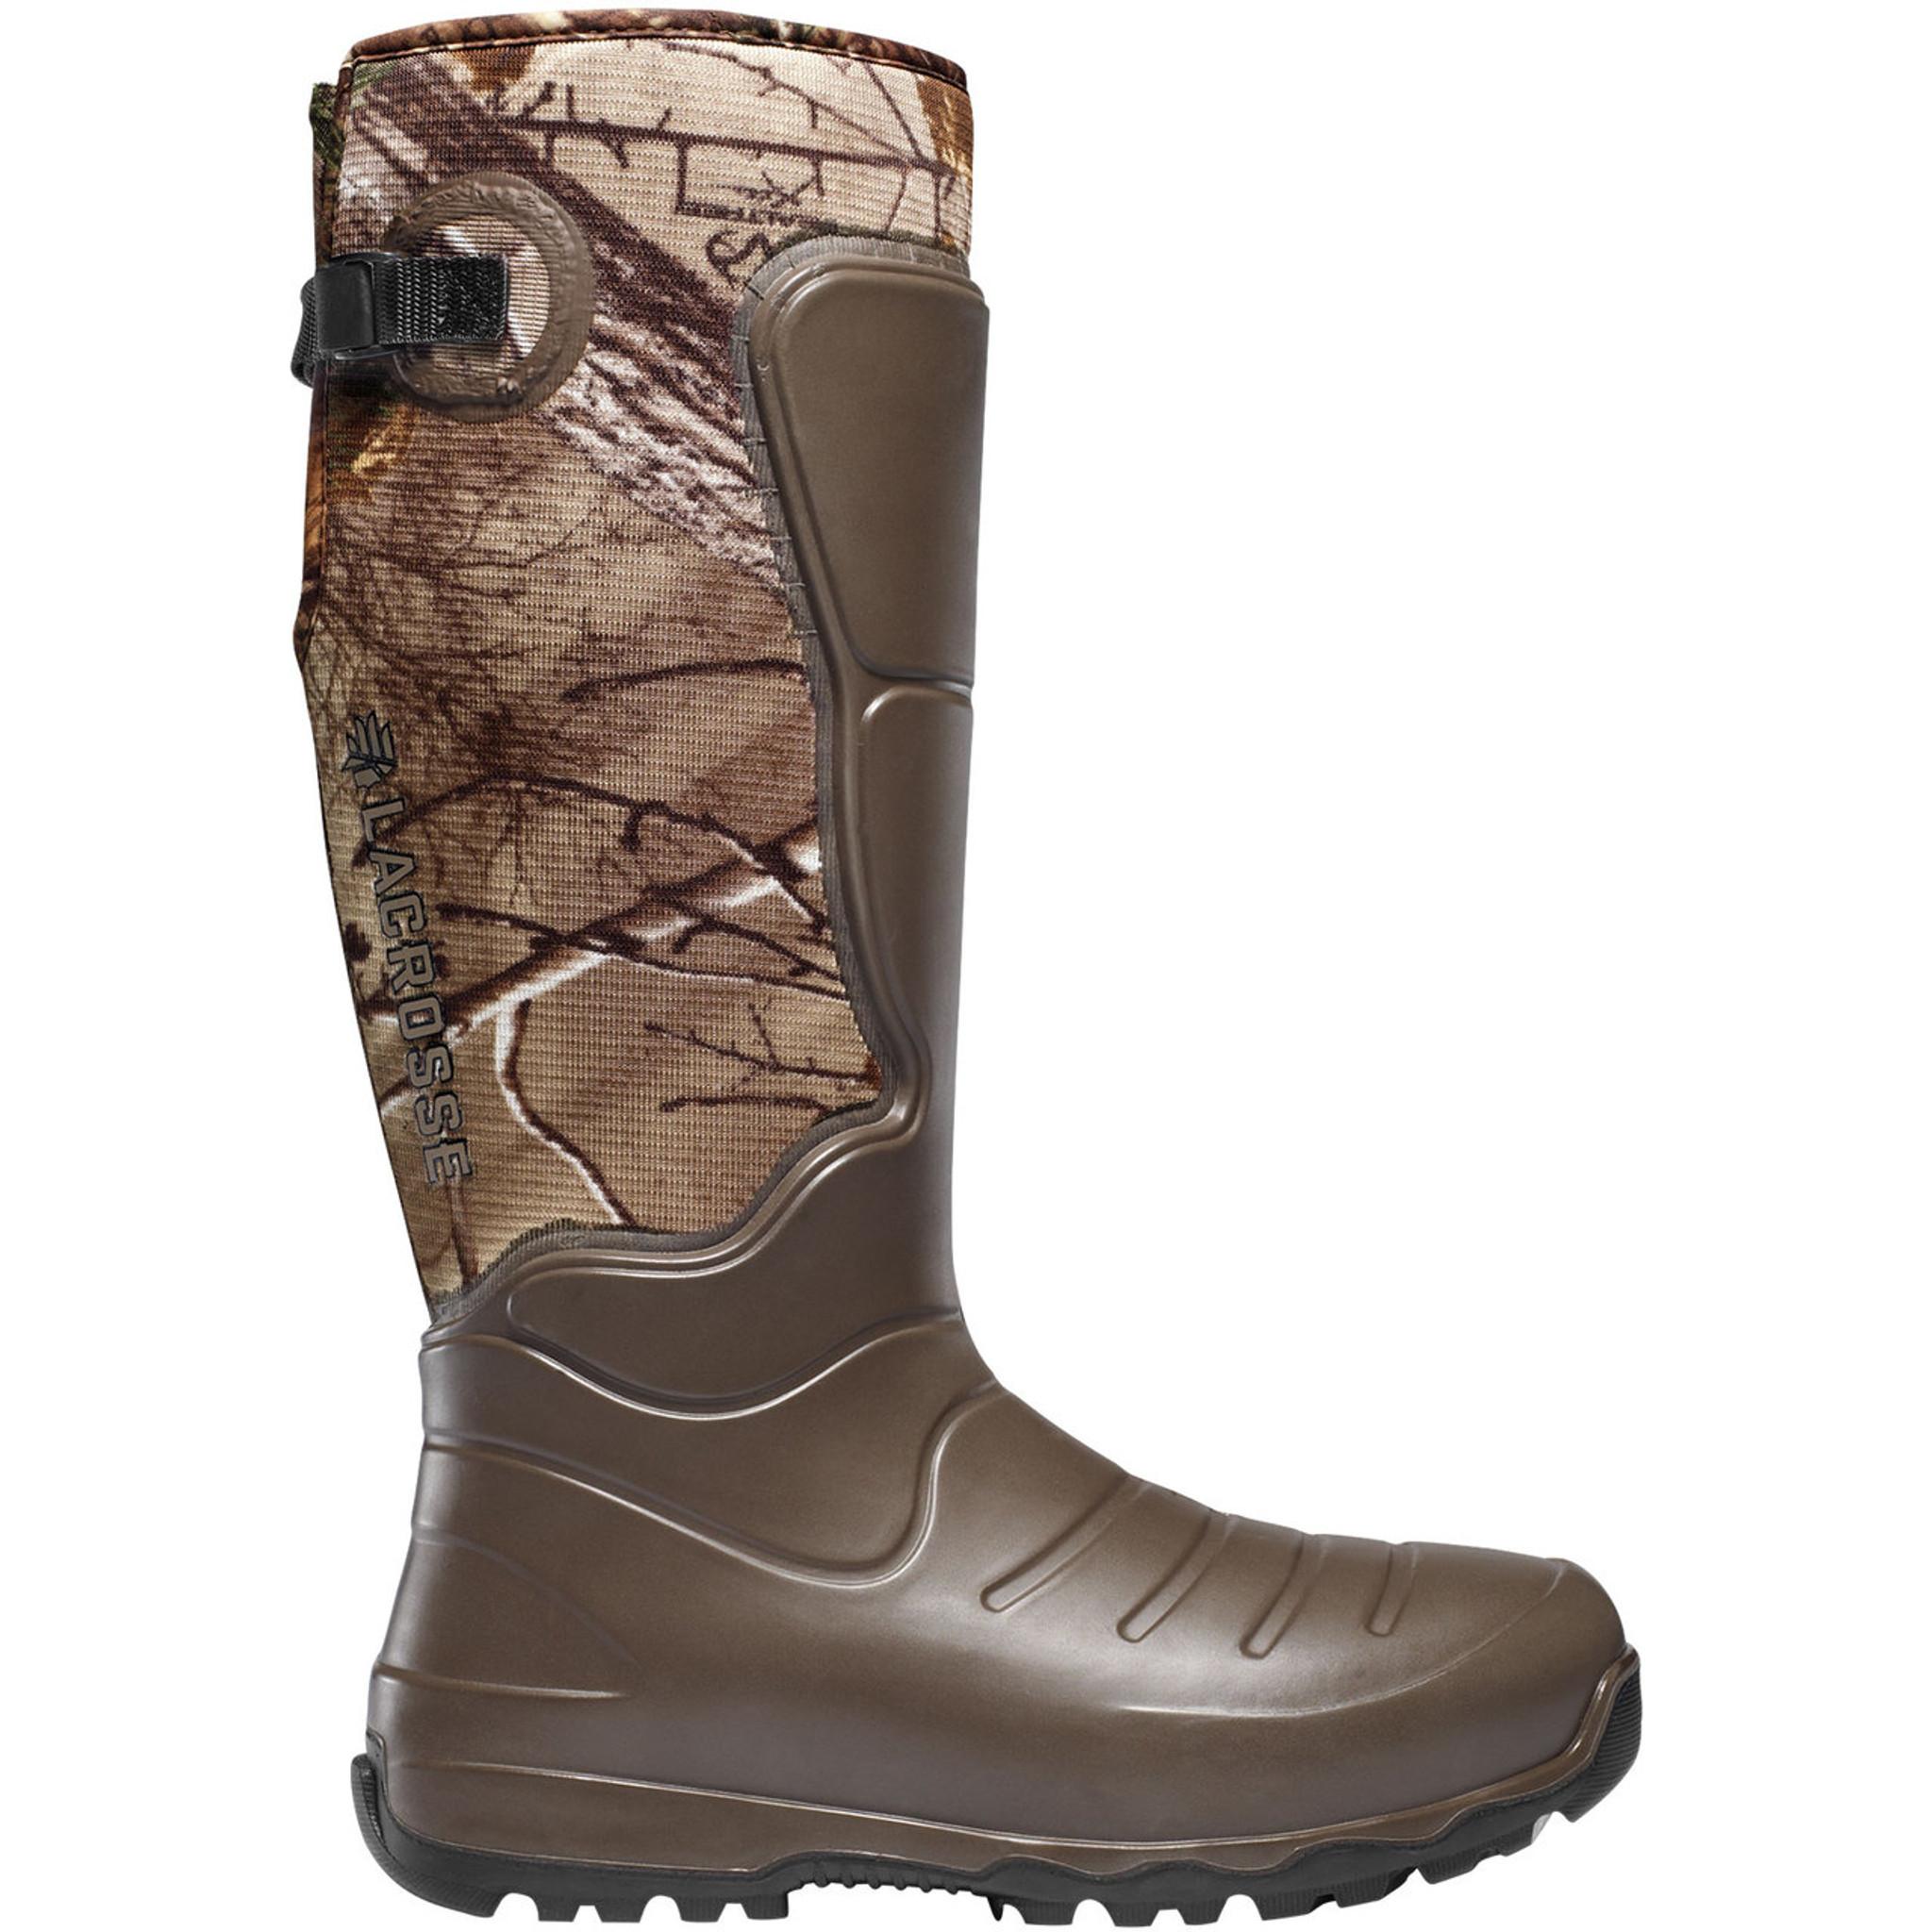 c18c5a23d6c Lacrosse Aerohead 7.00 mm hunting boot waterproof